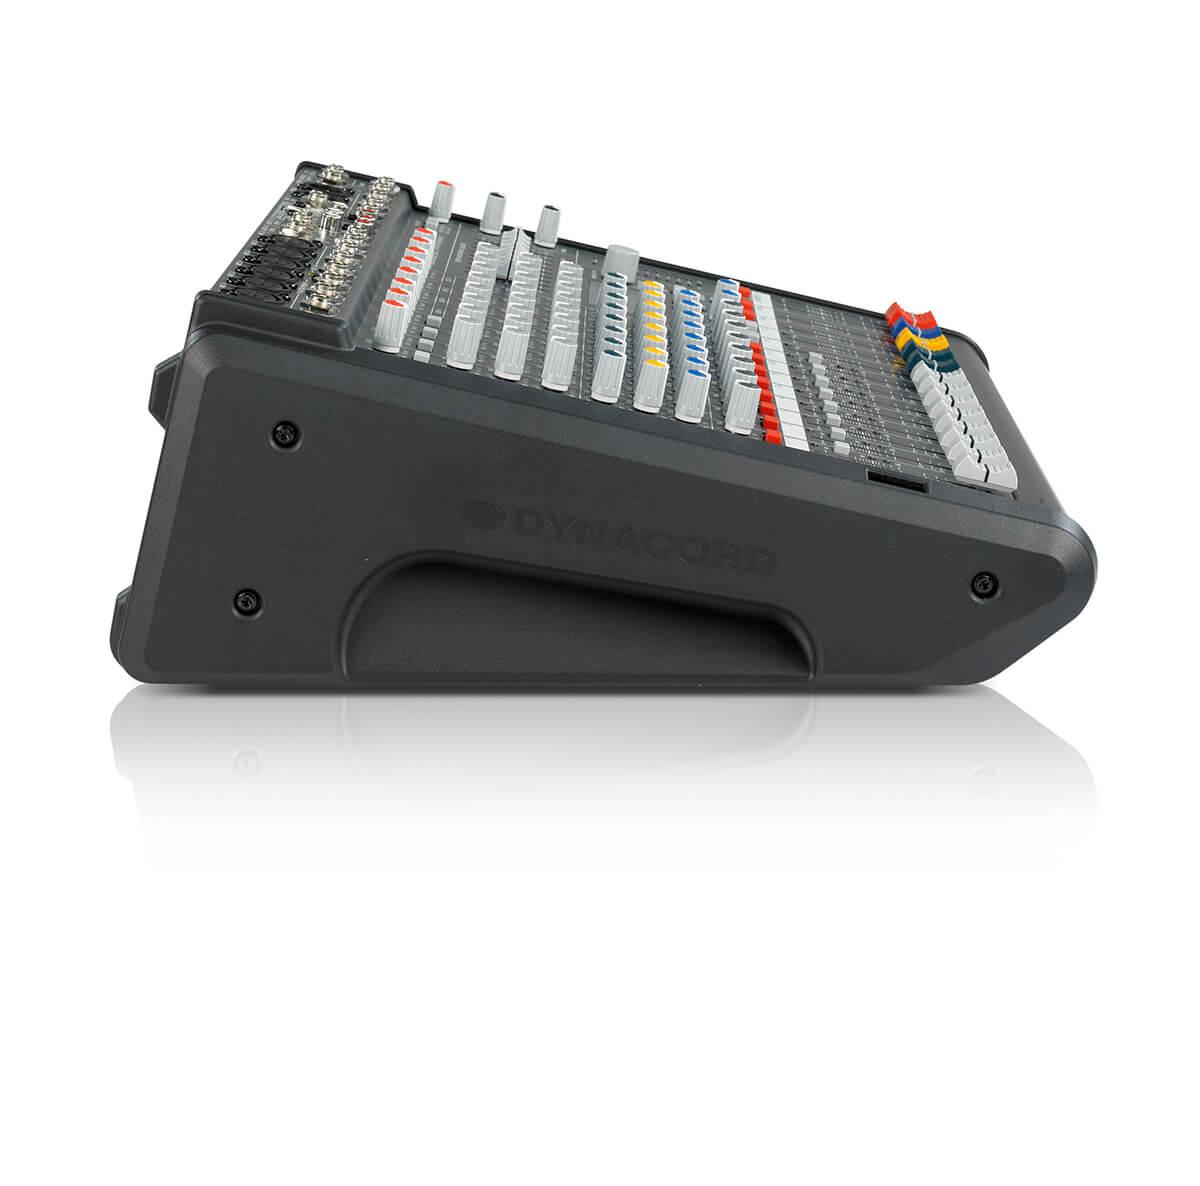 Mixer Dynacord Powermate 600-3 giá rẻ